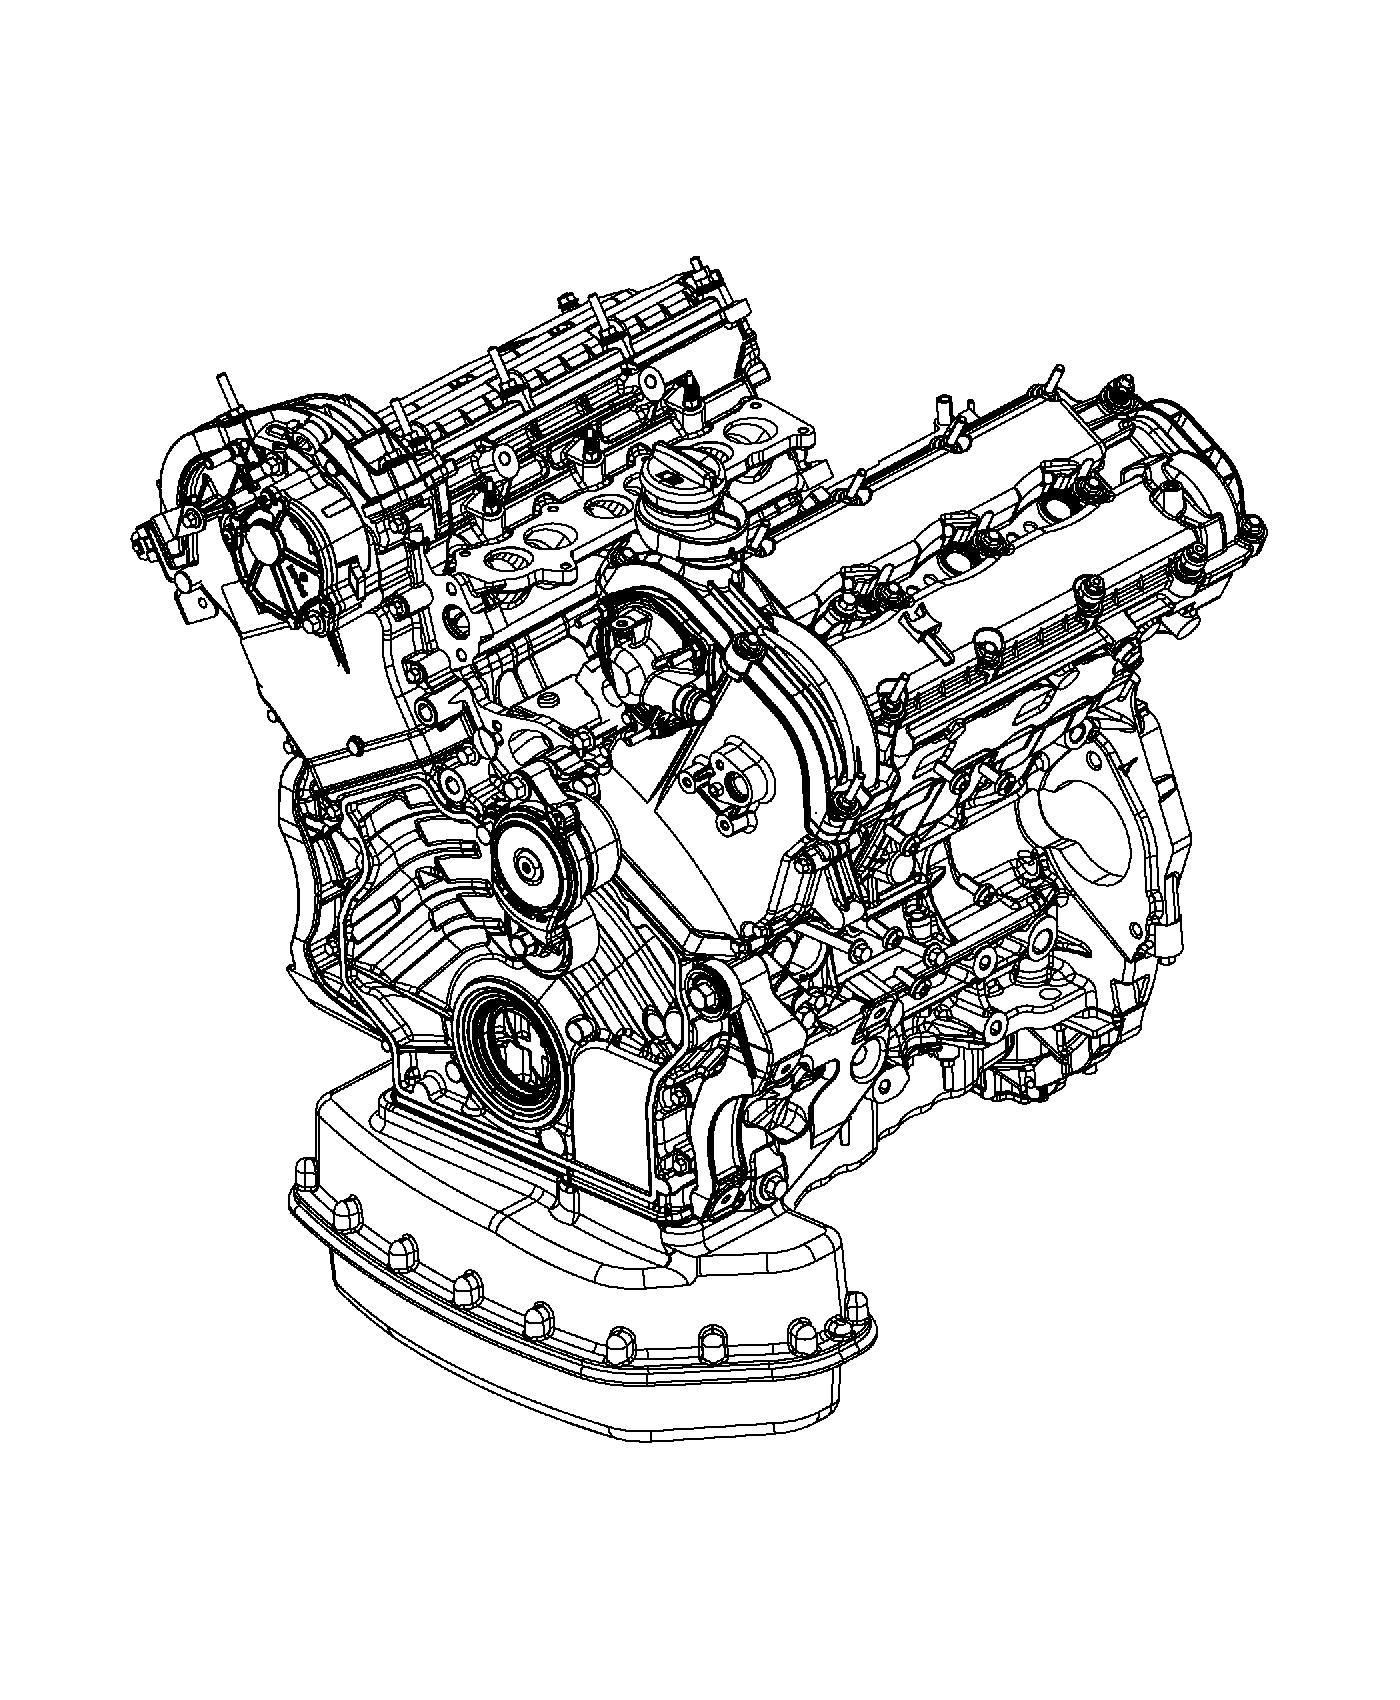 Jeep Grand Cherokee Engine Long Block Emissions